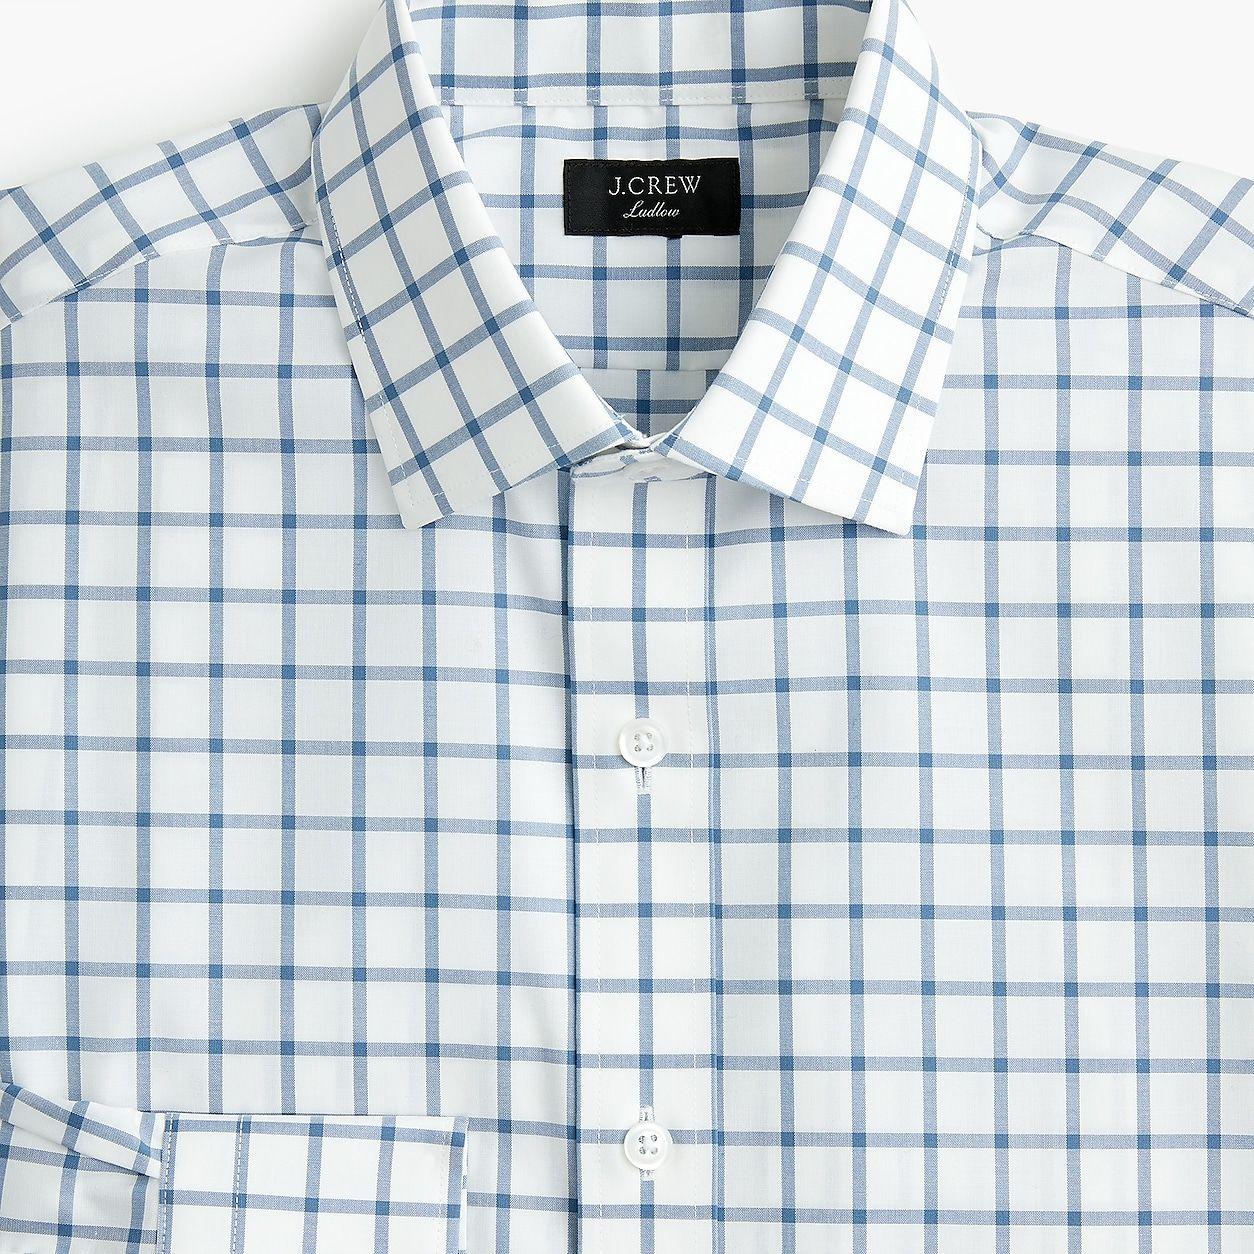 bacae0262f570 Ludlow Stretch Two-Ply Easy-Care Cotton Dress Shirt In Mini Windowpane